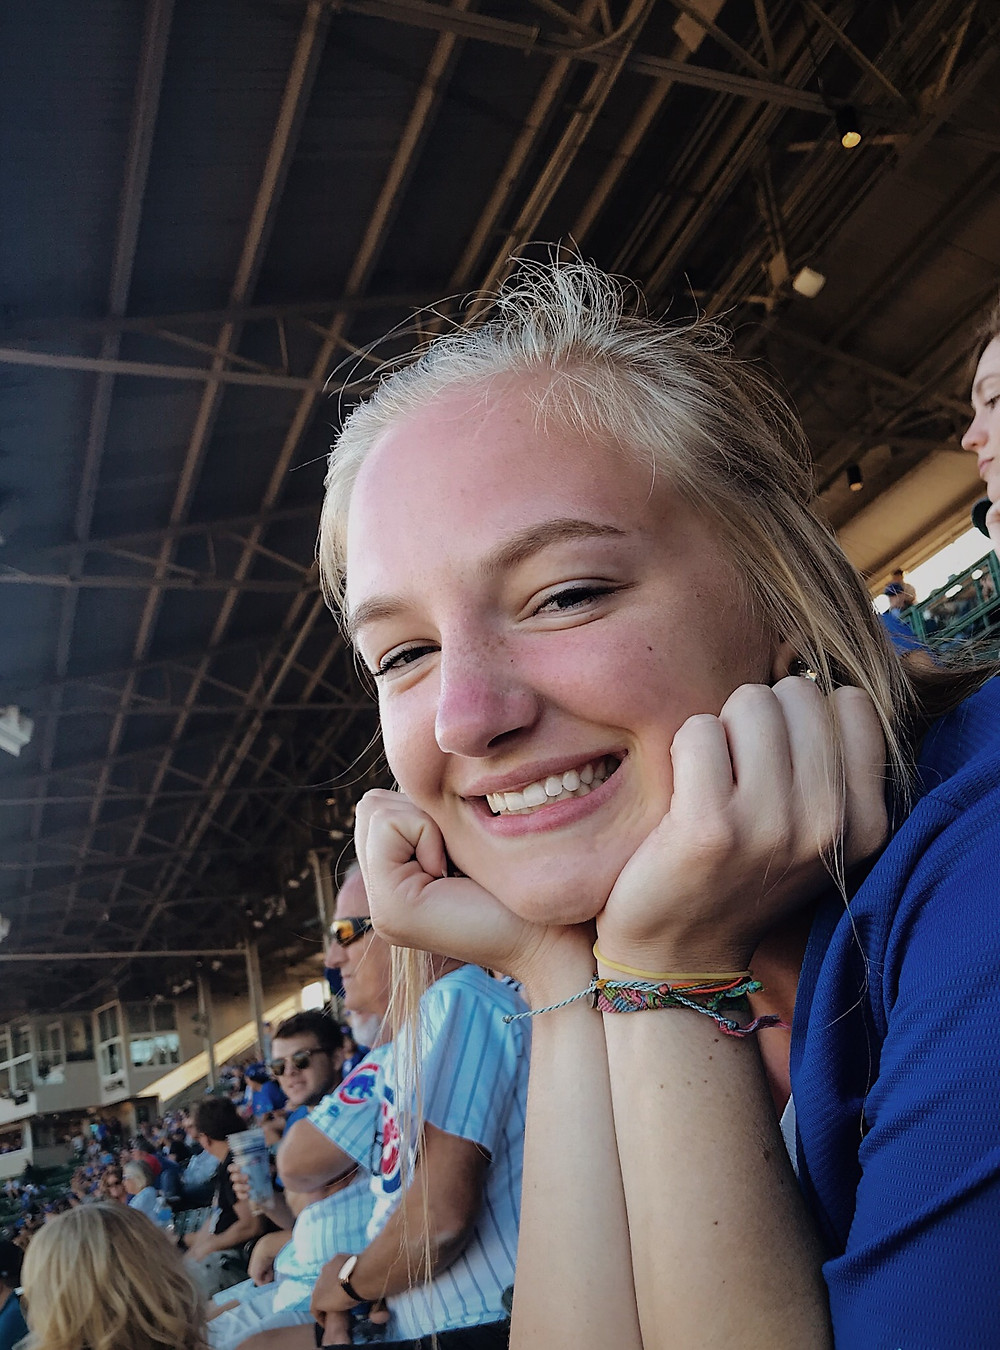 Lauren at a Cubs game.